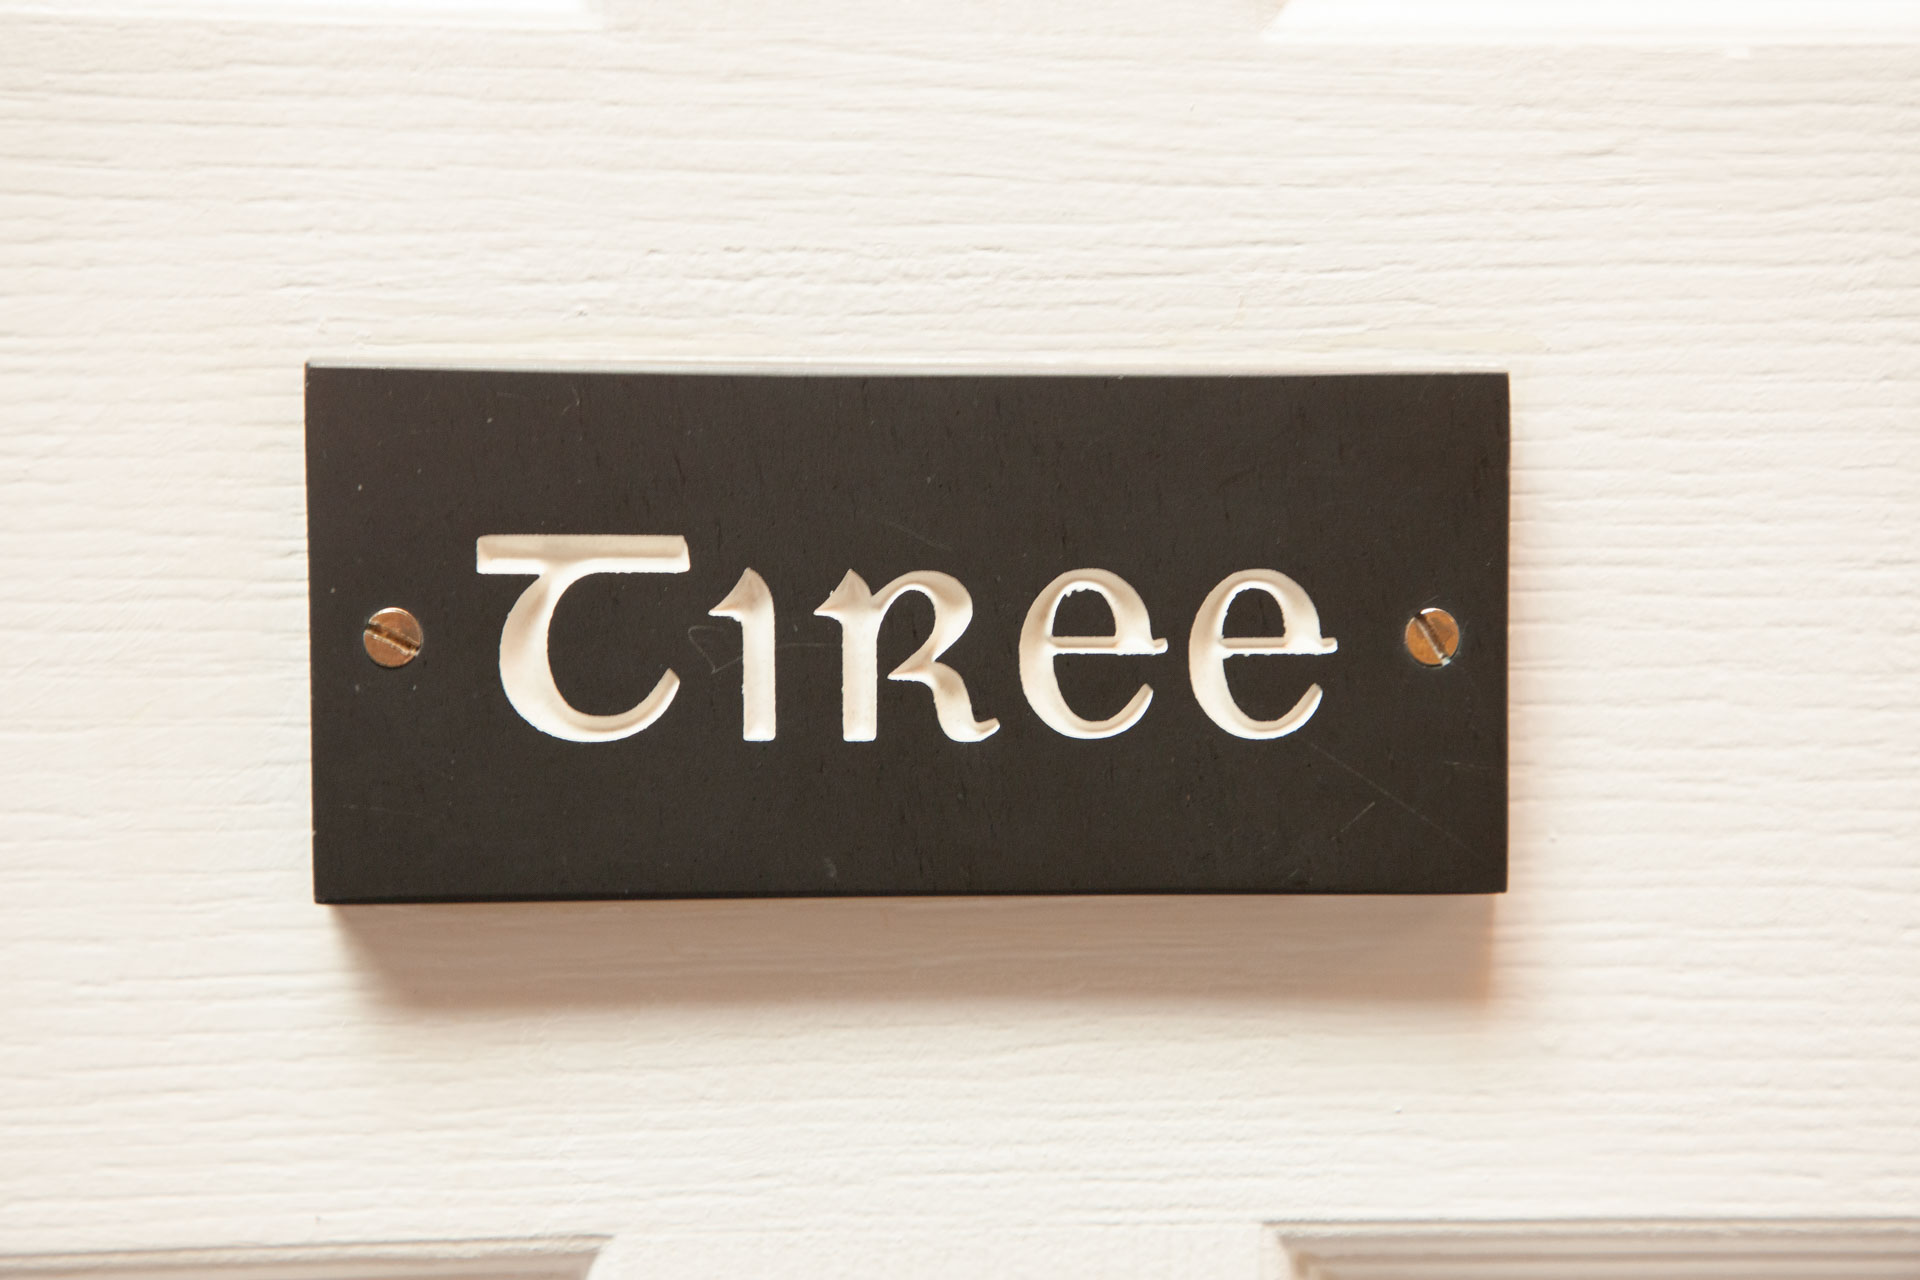 web-1Z6E9487 Tiree